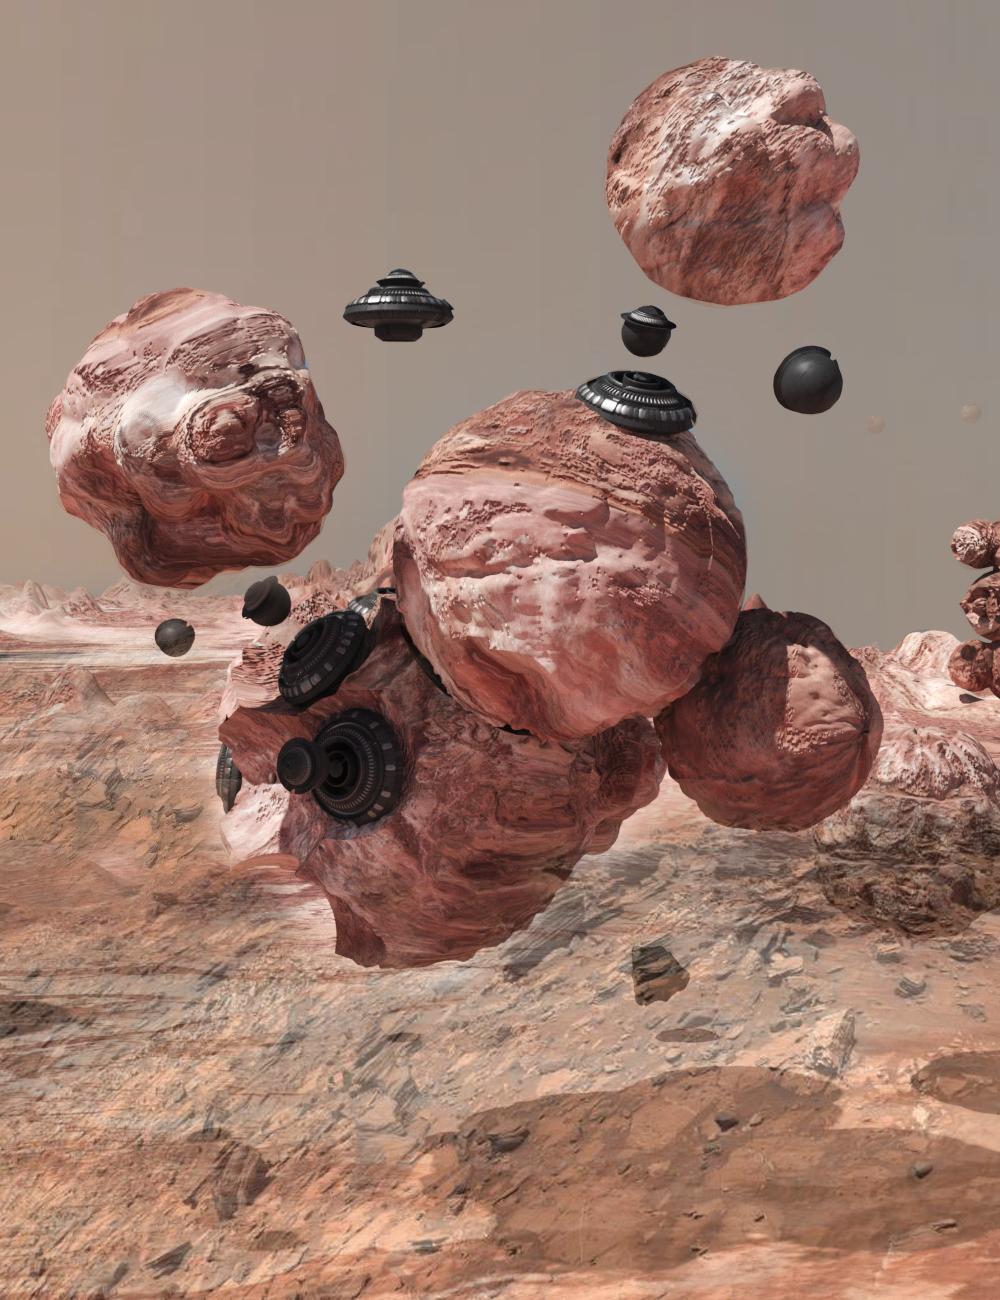 Spray Foam Habitat on Mars built by Semi-Autonomous Drone Robots